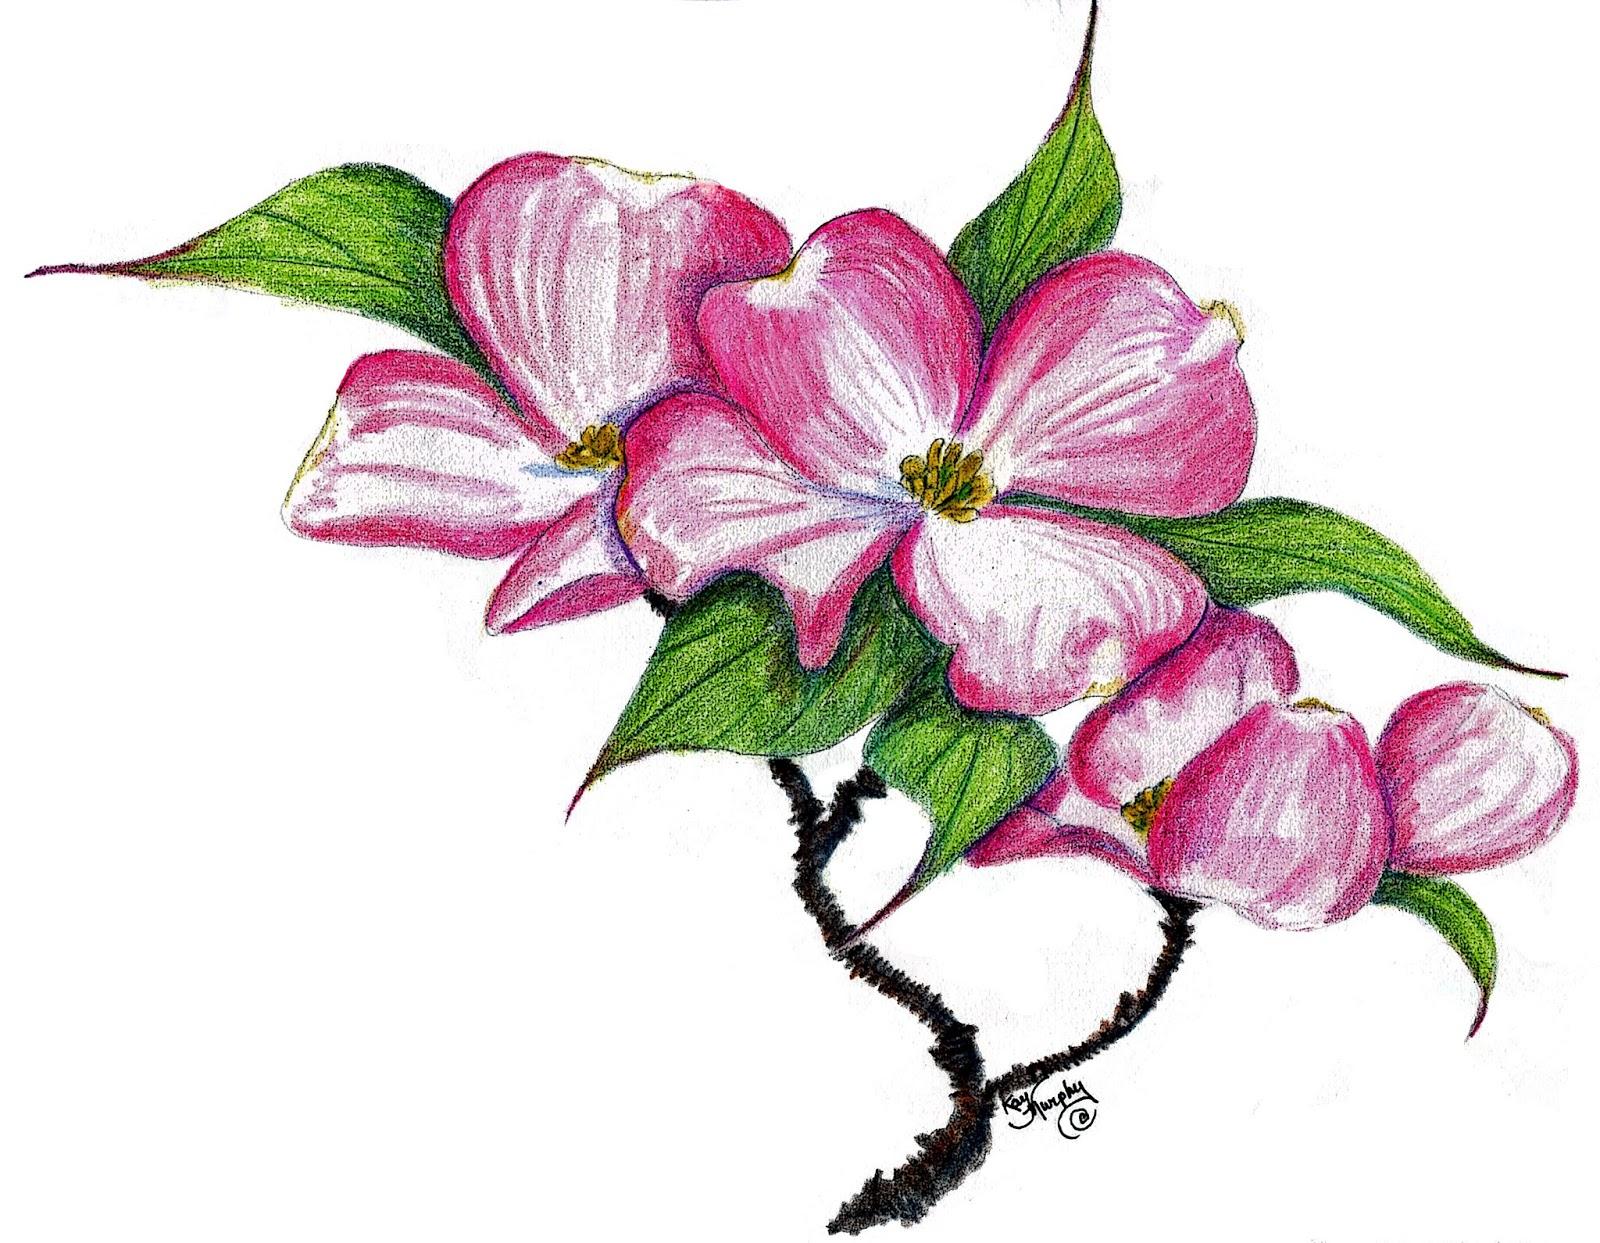 Cornus Blossom clipart #6, Download drawings